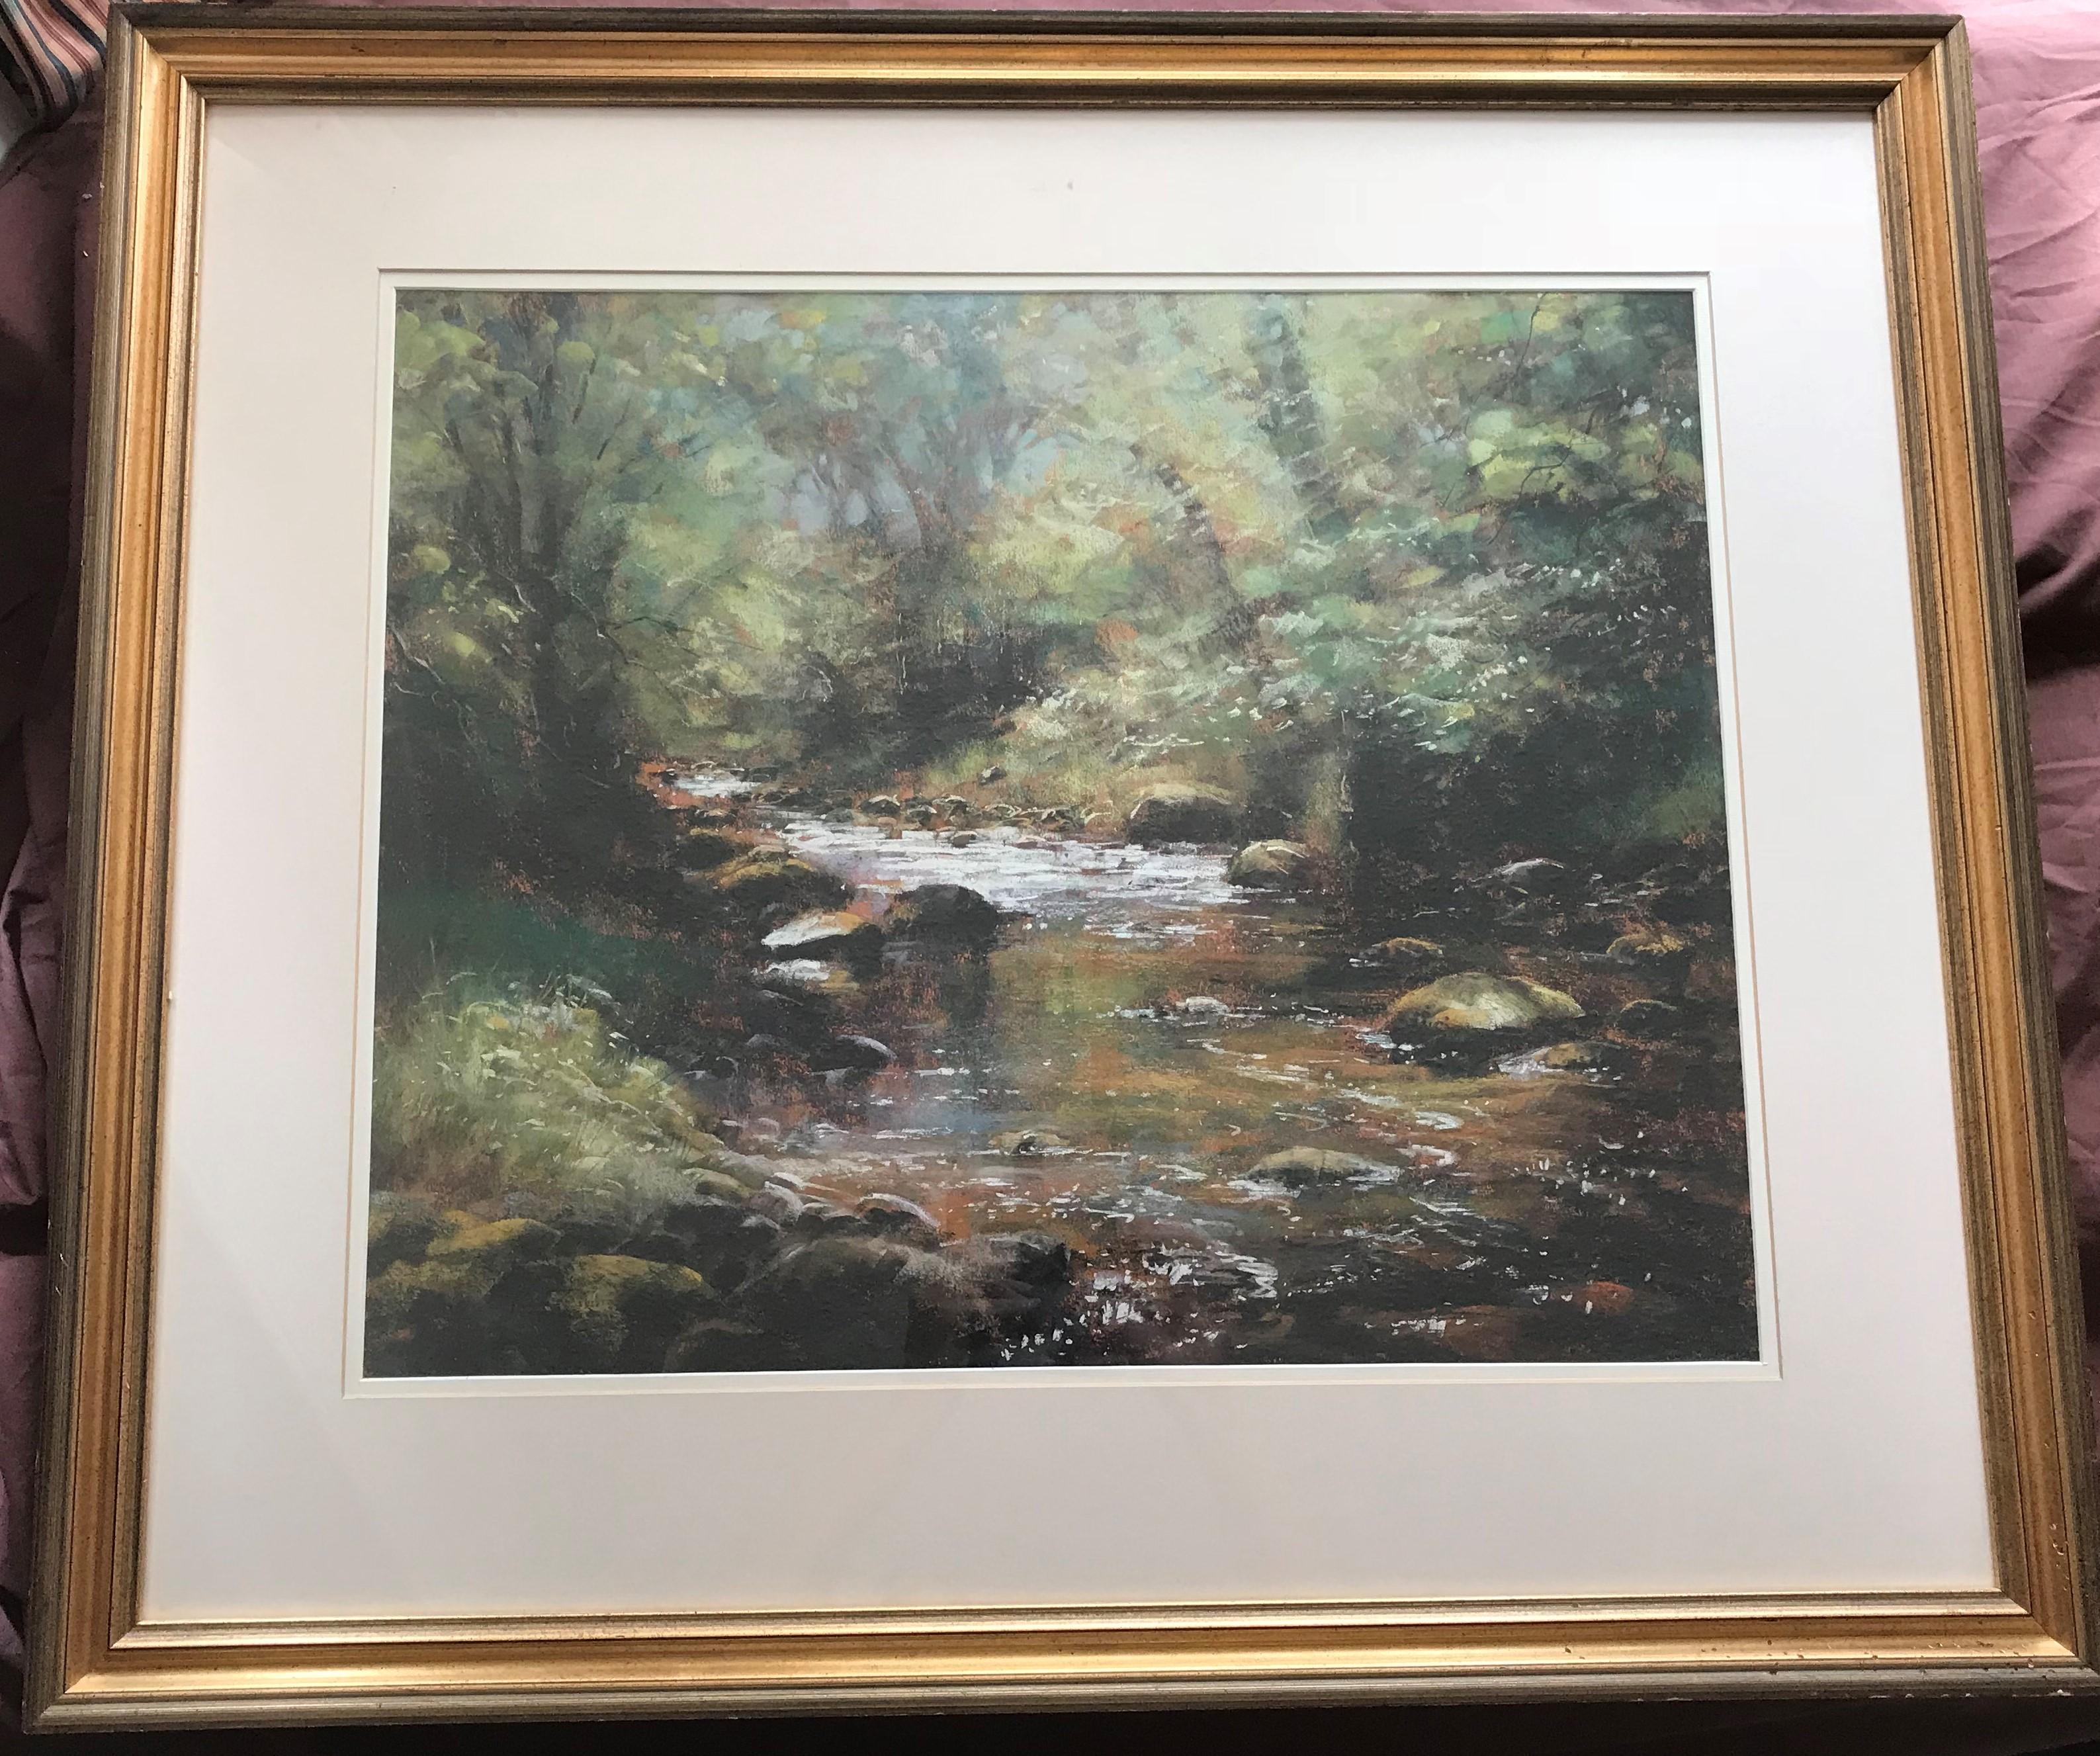 Forrest Stream in Dappled Sun pastel by Scottish artist Robert Turnbull 20th C - Image 2 of 4